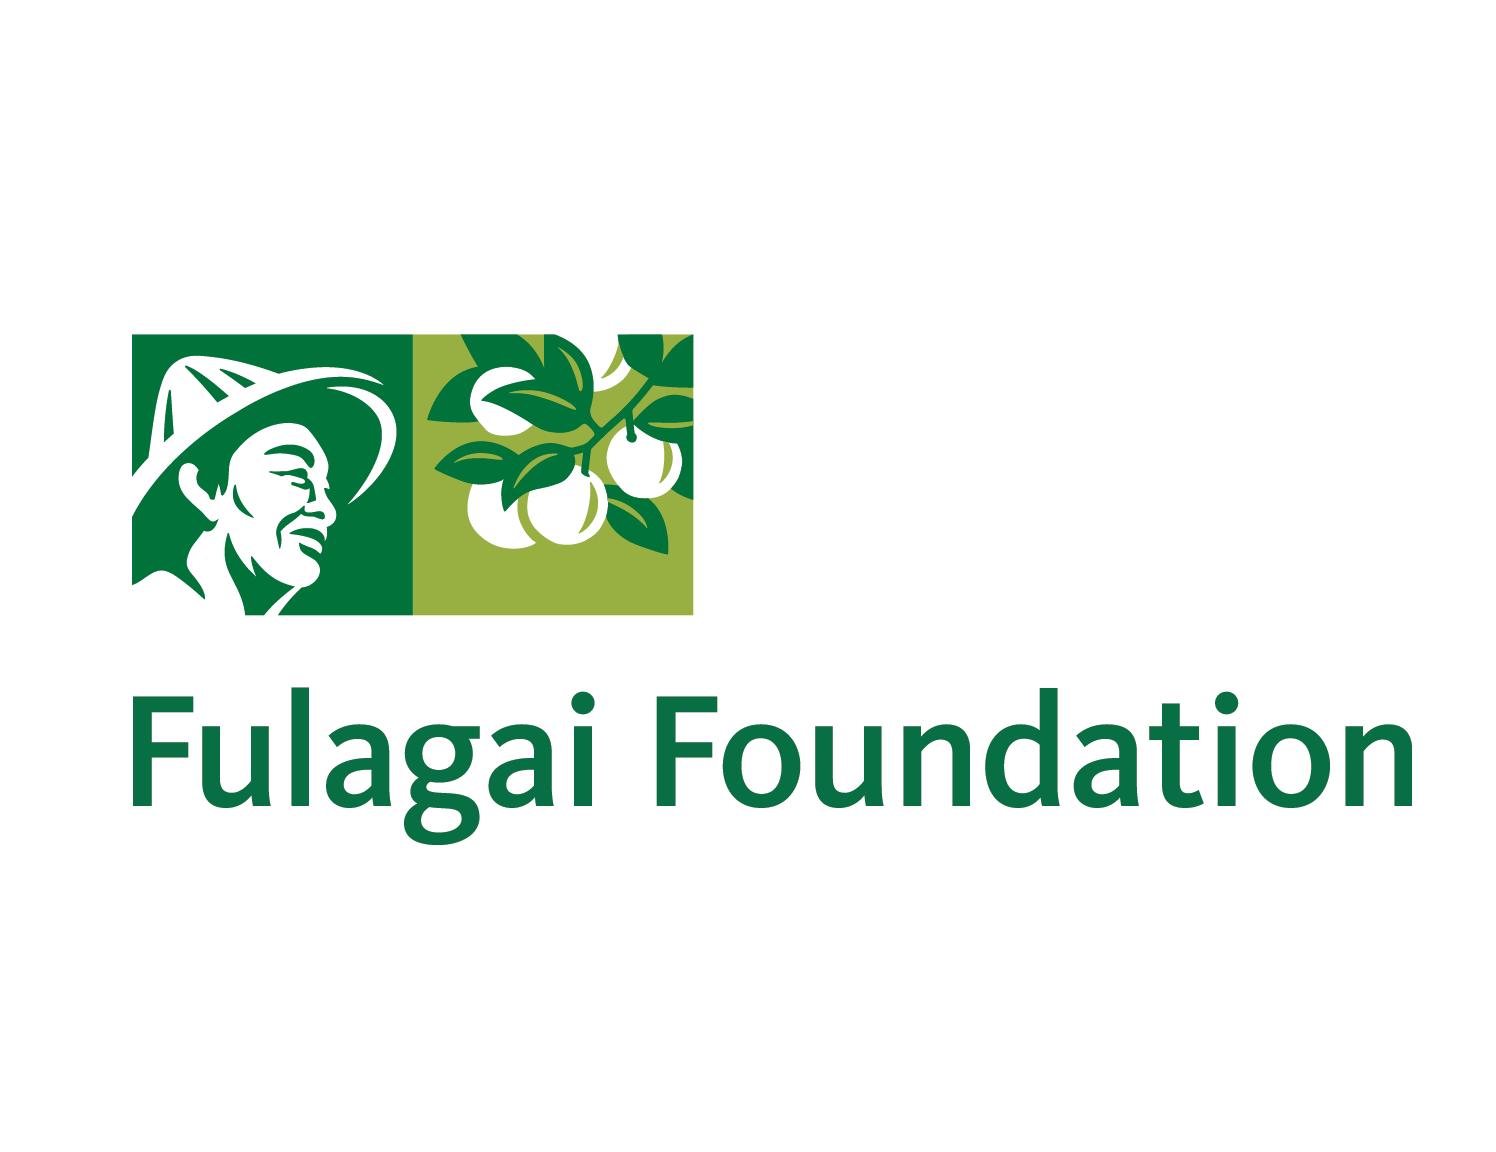 fulagai foundation logo